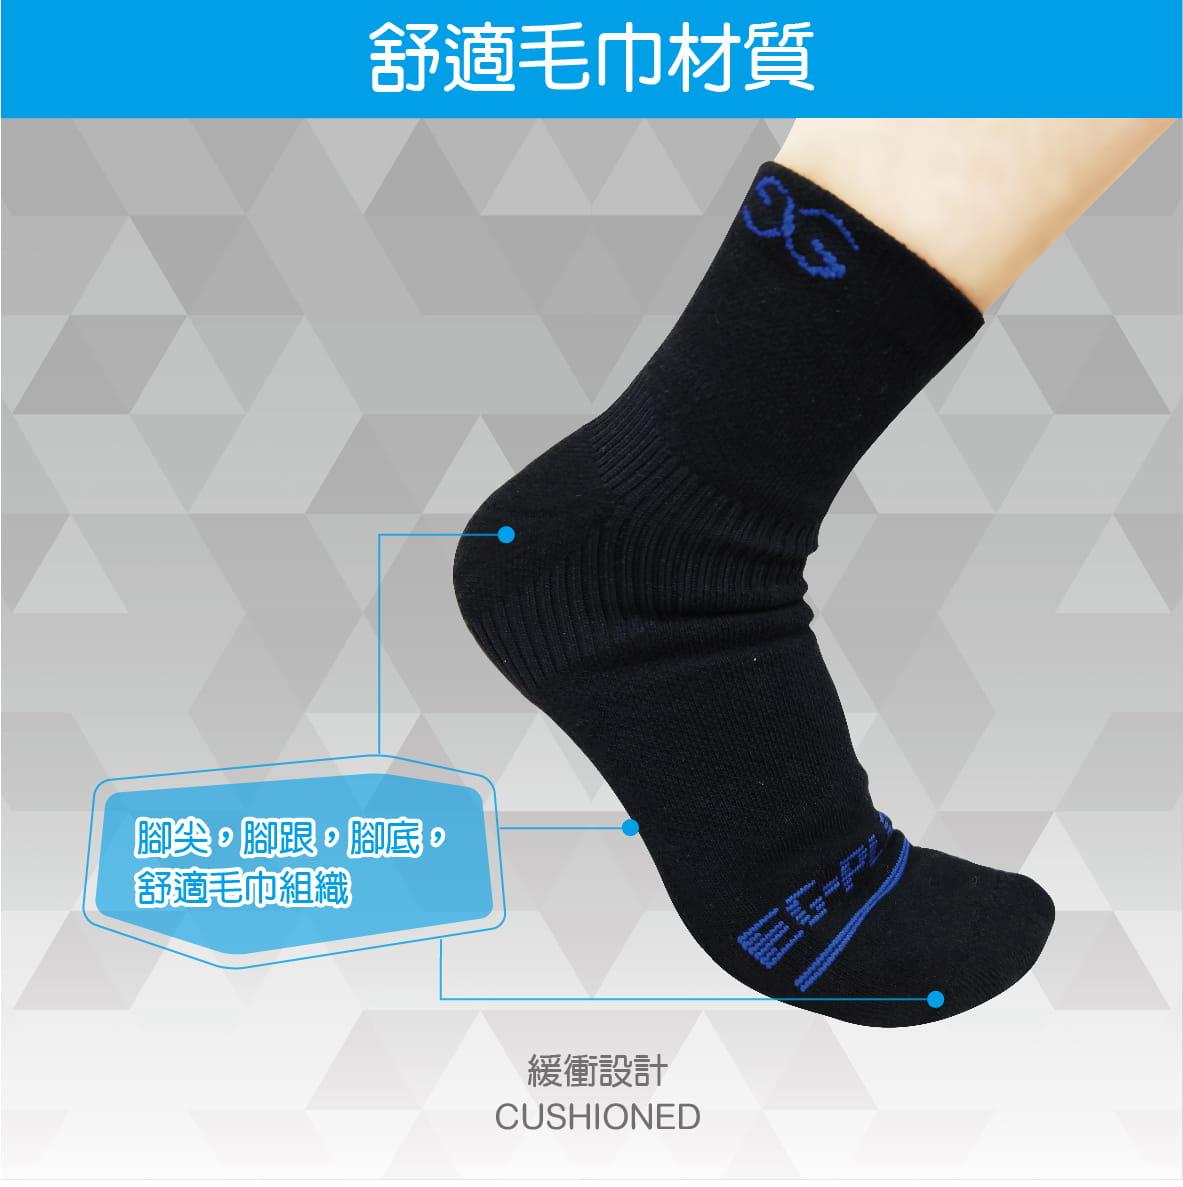 【EG-PLAY】SPORTS SOCKS 足踝支撐機能襪 4